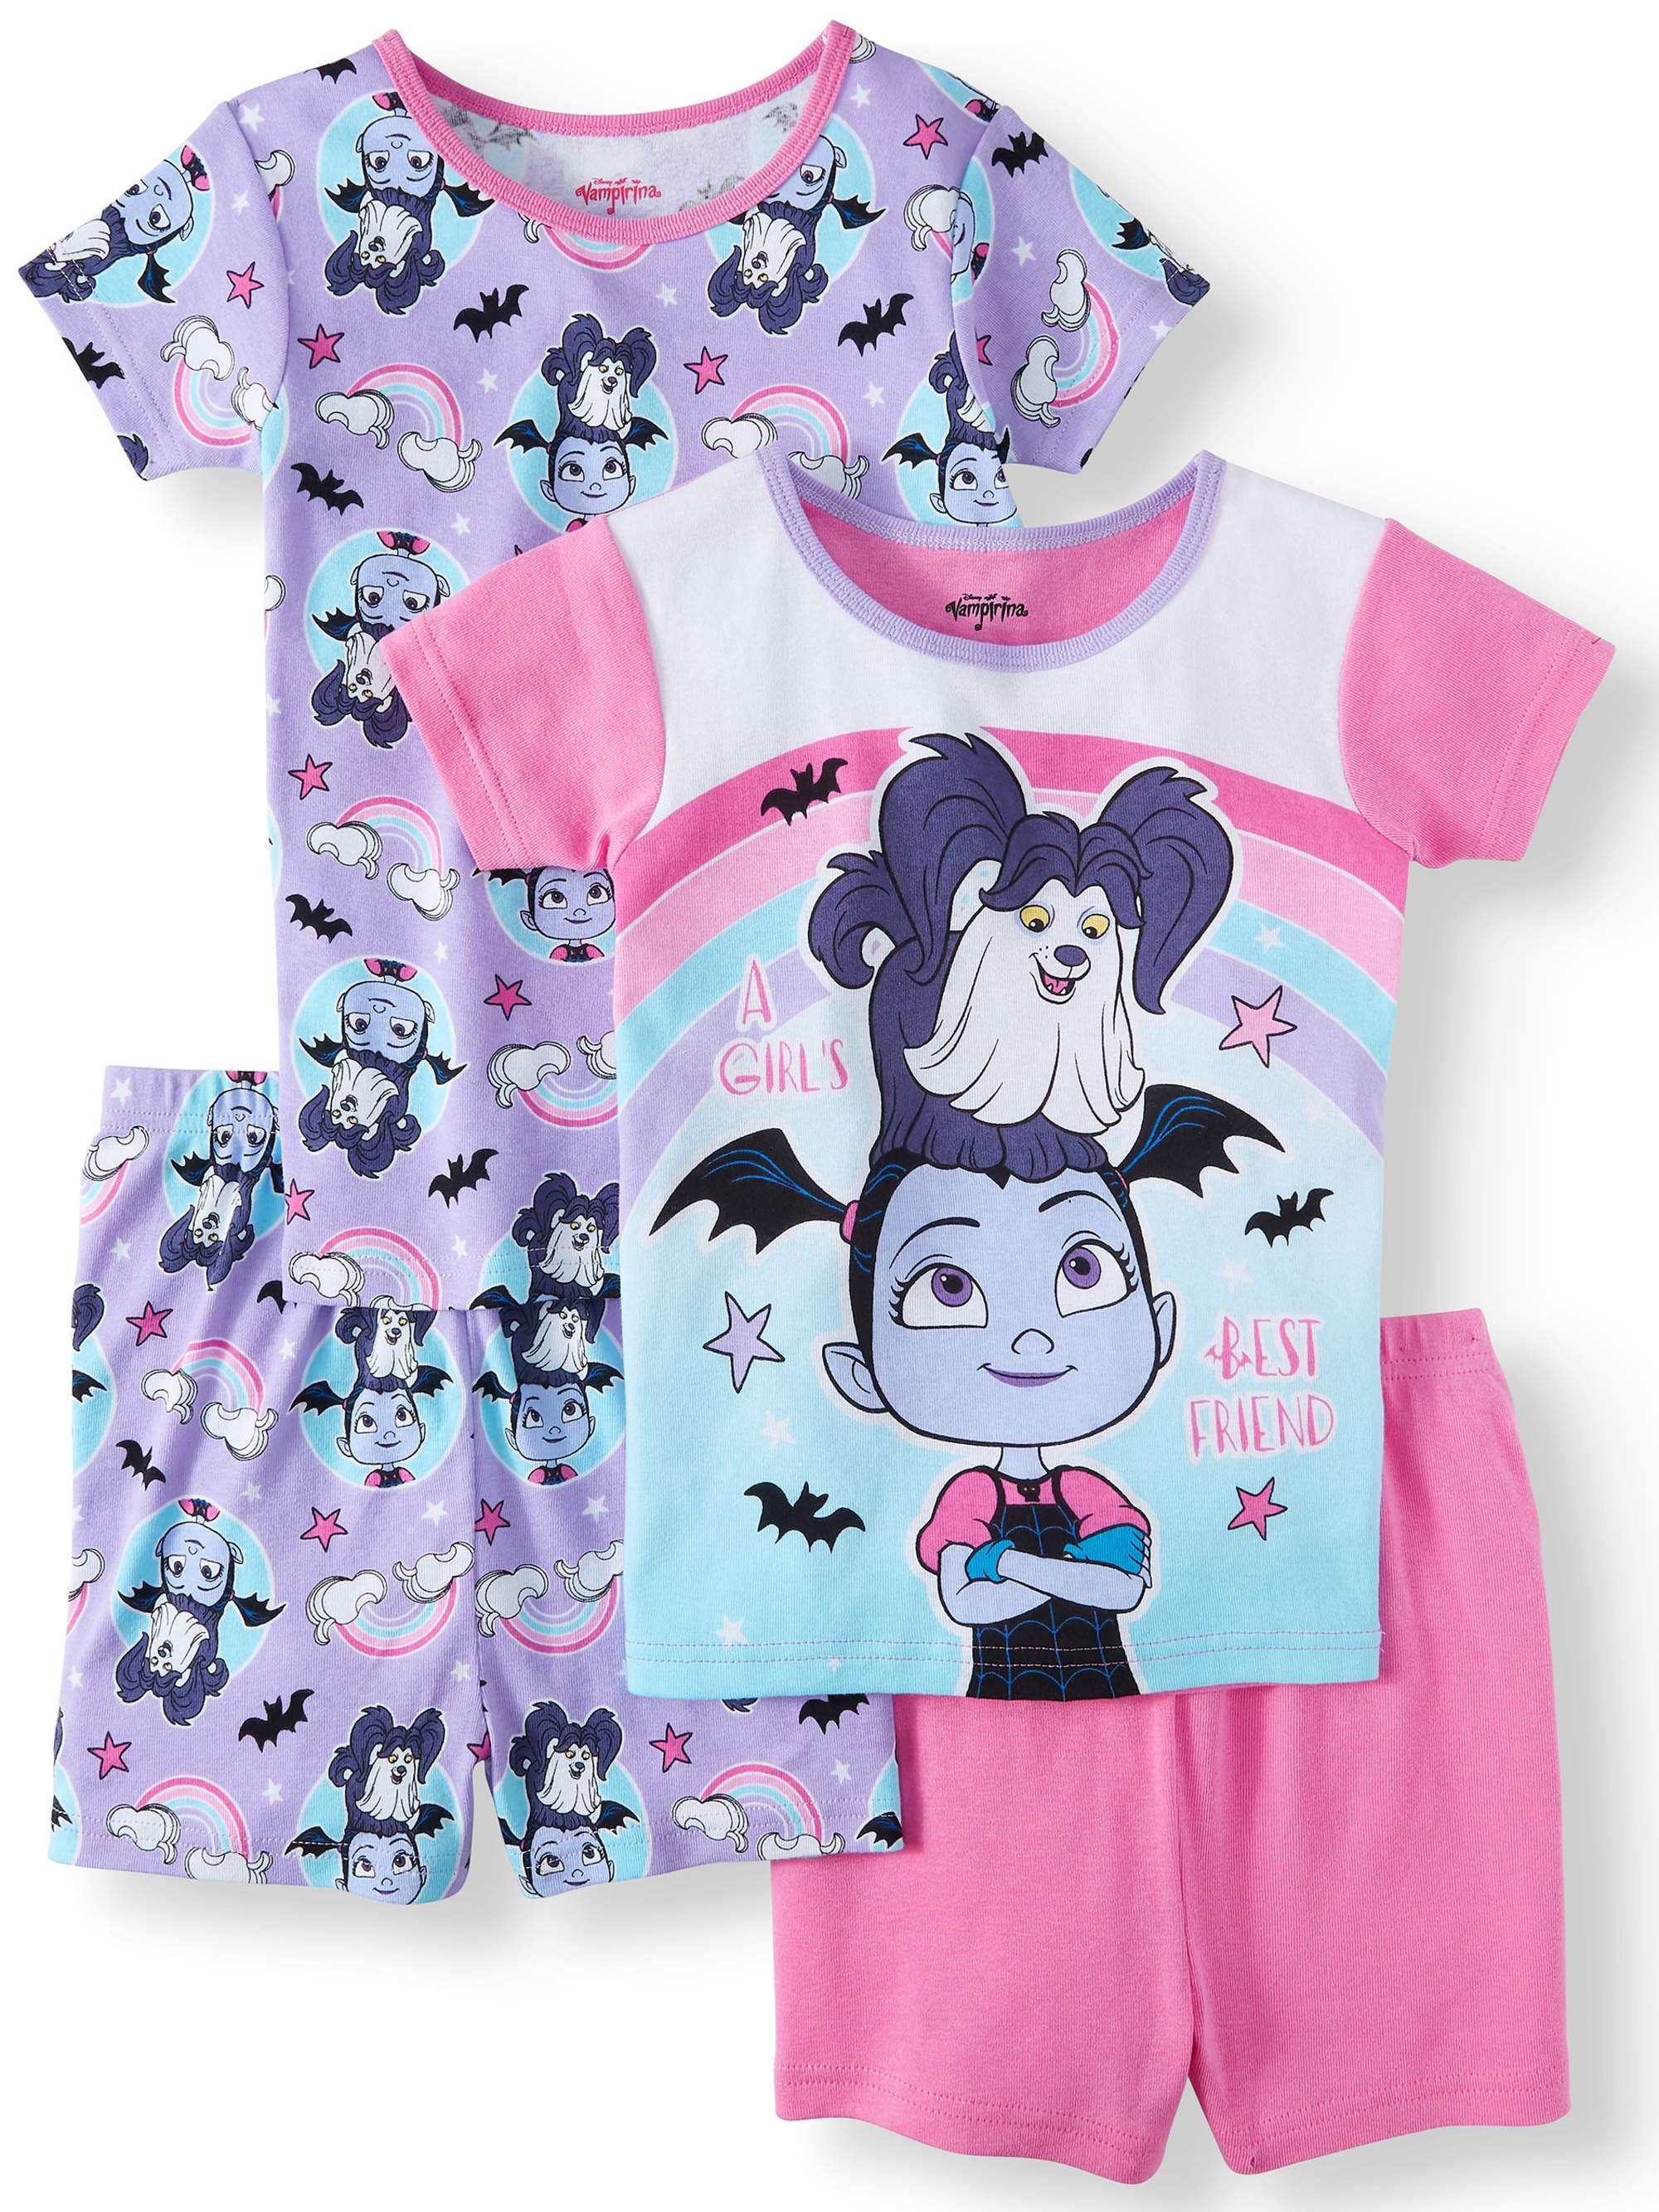 Girls' Vampirina 4 Piece Pajama Sleep Set (Little Girl & Big Girl)